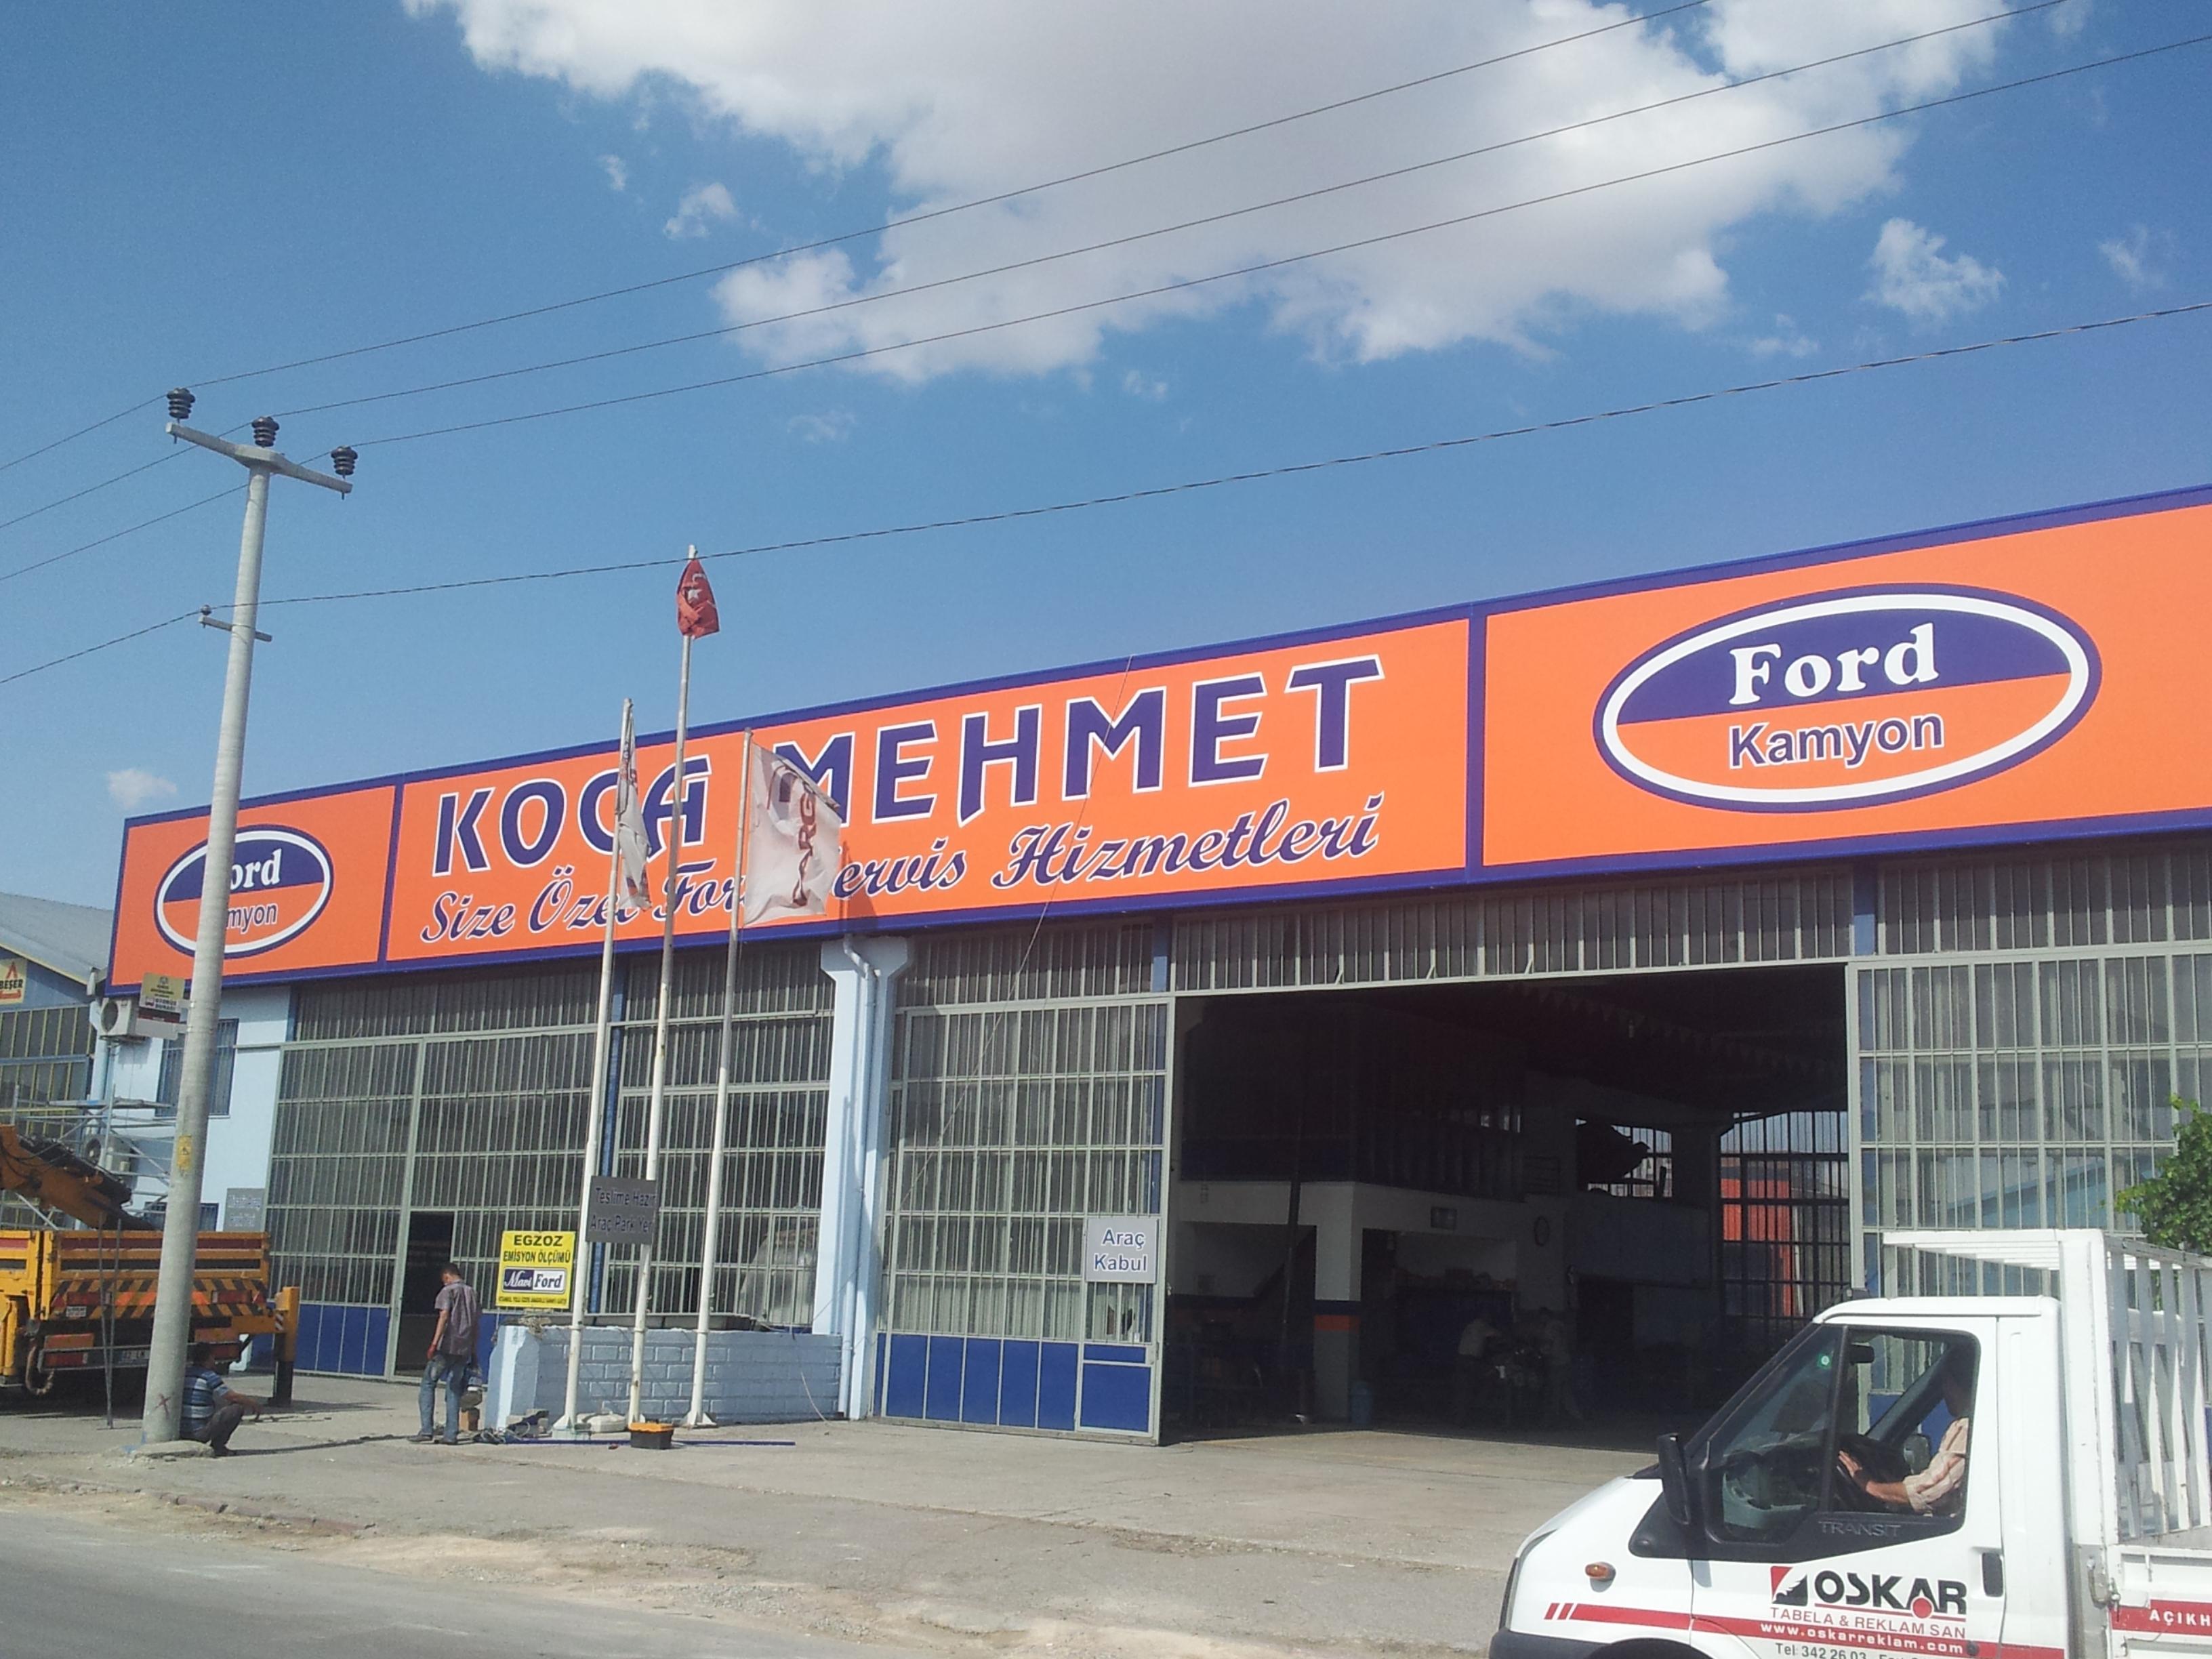 KOCA MEHMET FORD SERVİSİ_1